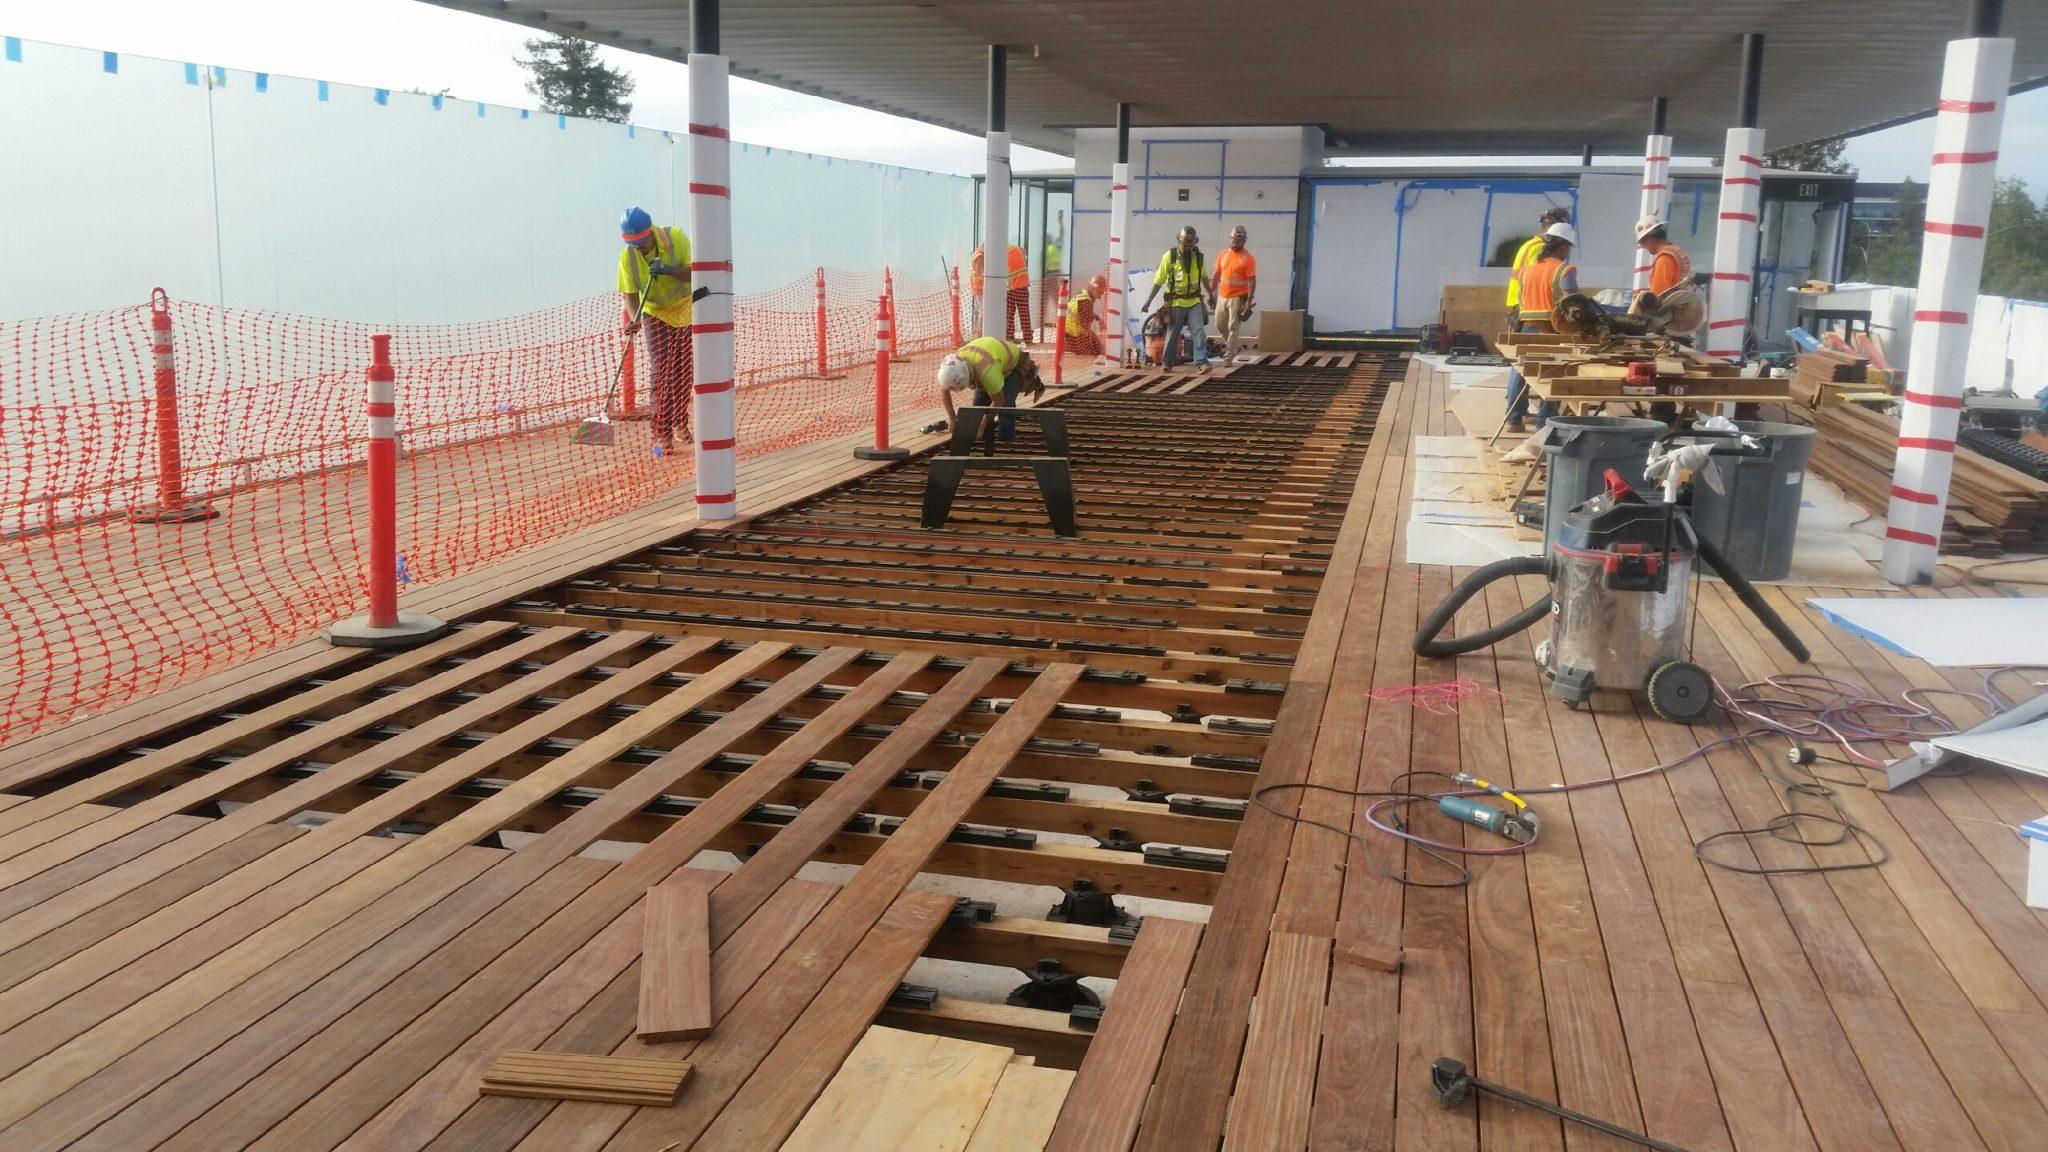 Cumaru Board Decking Over Buzon Pedestals